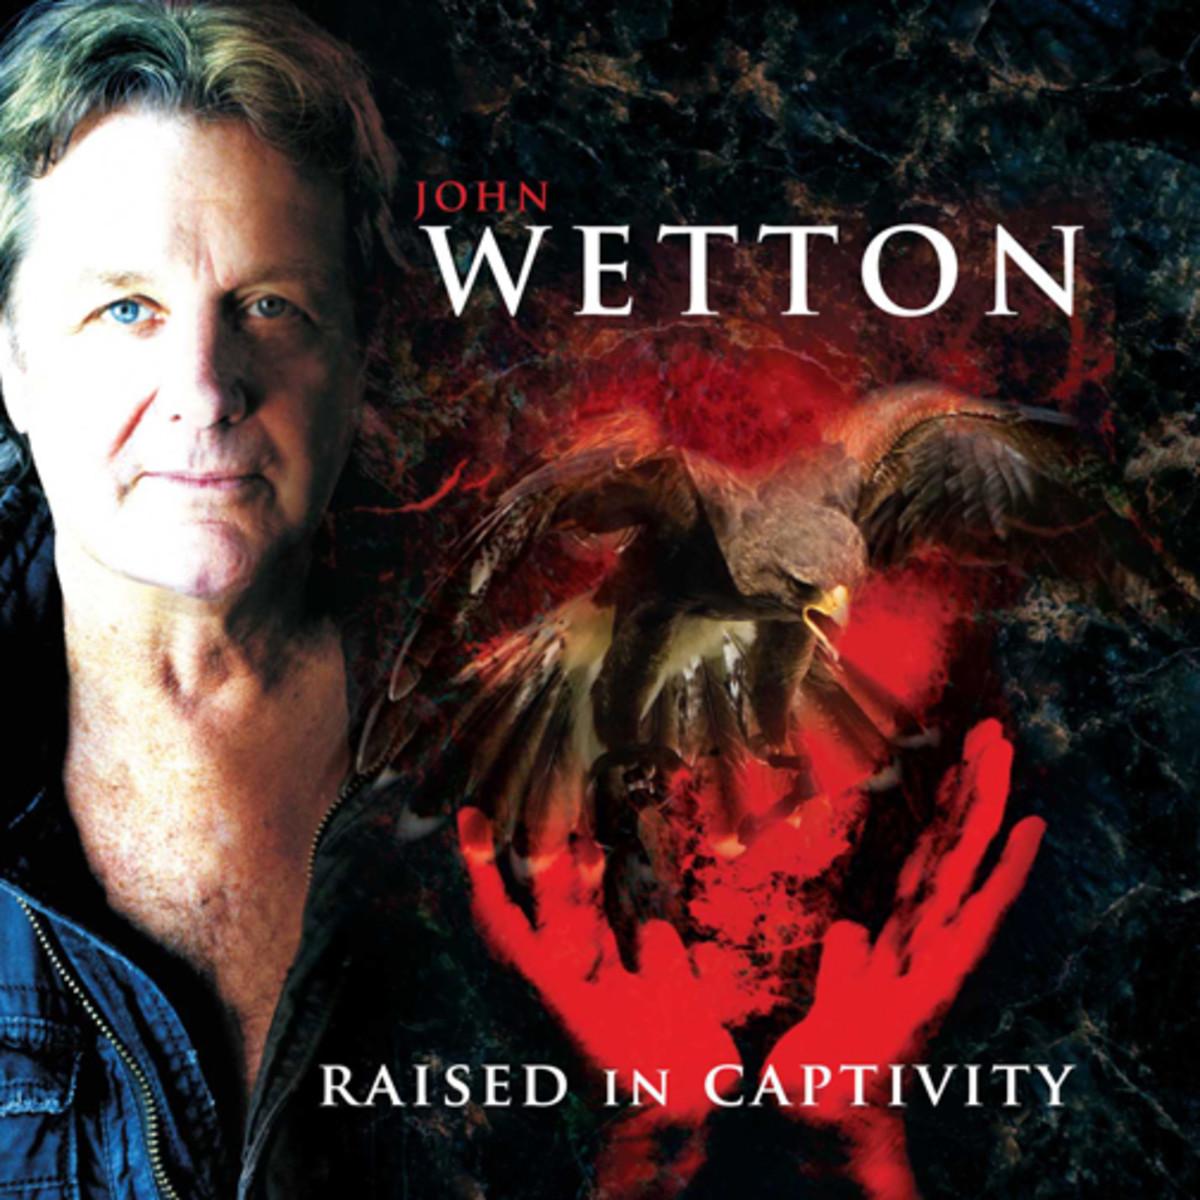 John Wetton Raised in Captivity